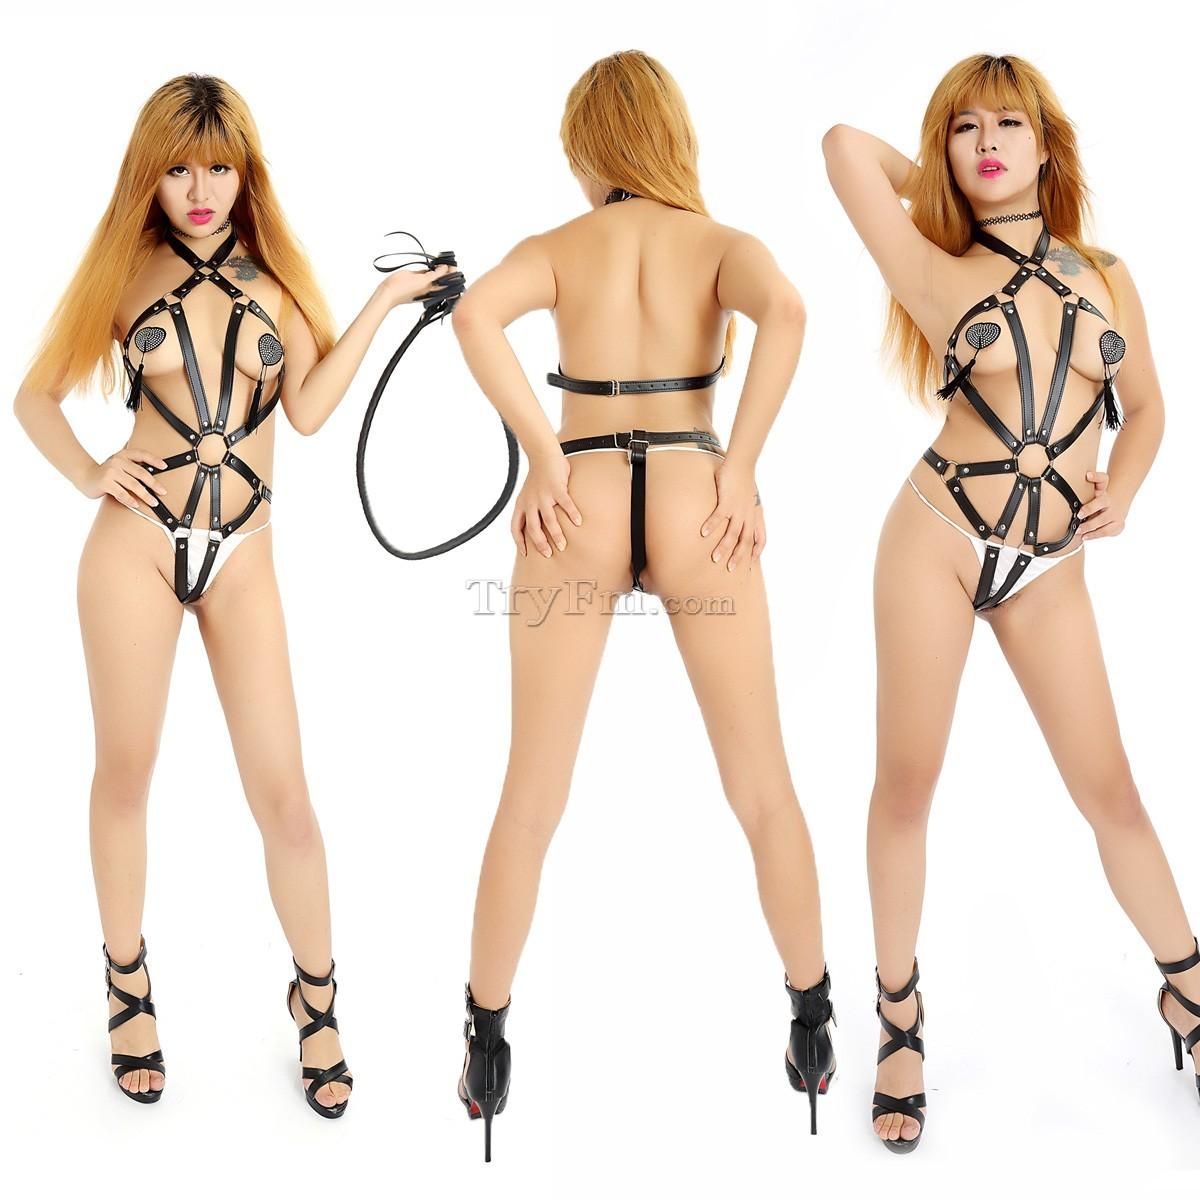 4-Leather-strap-rider-10.jpg